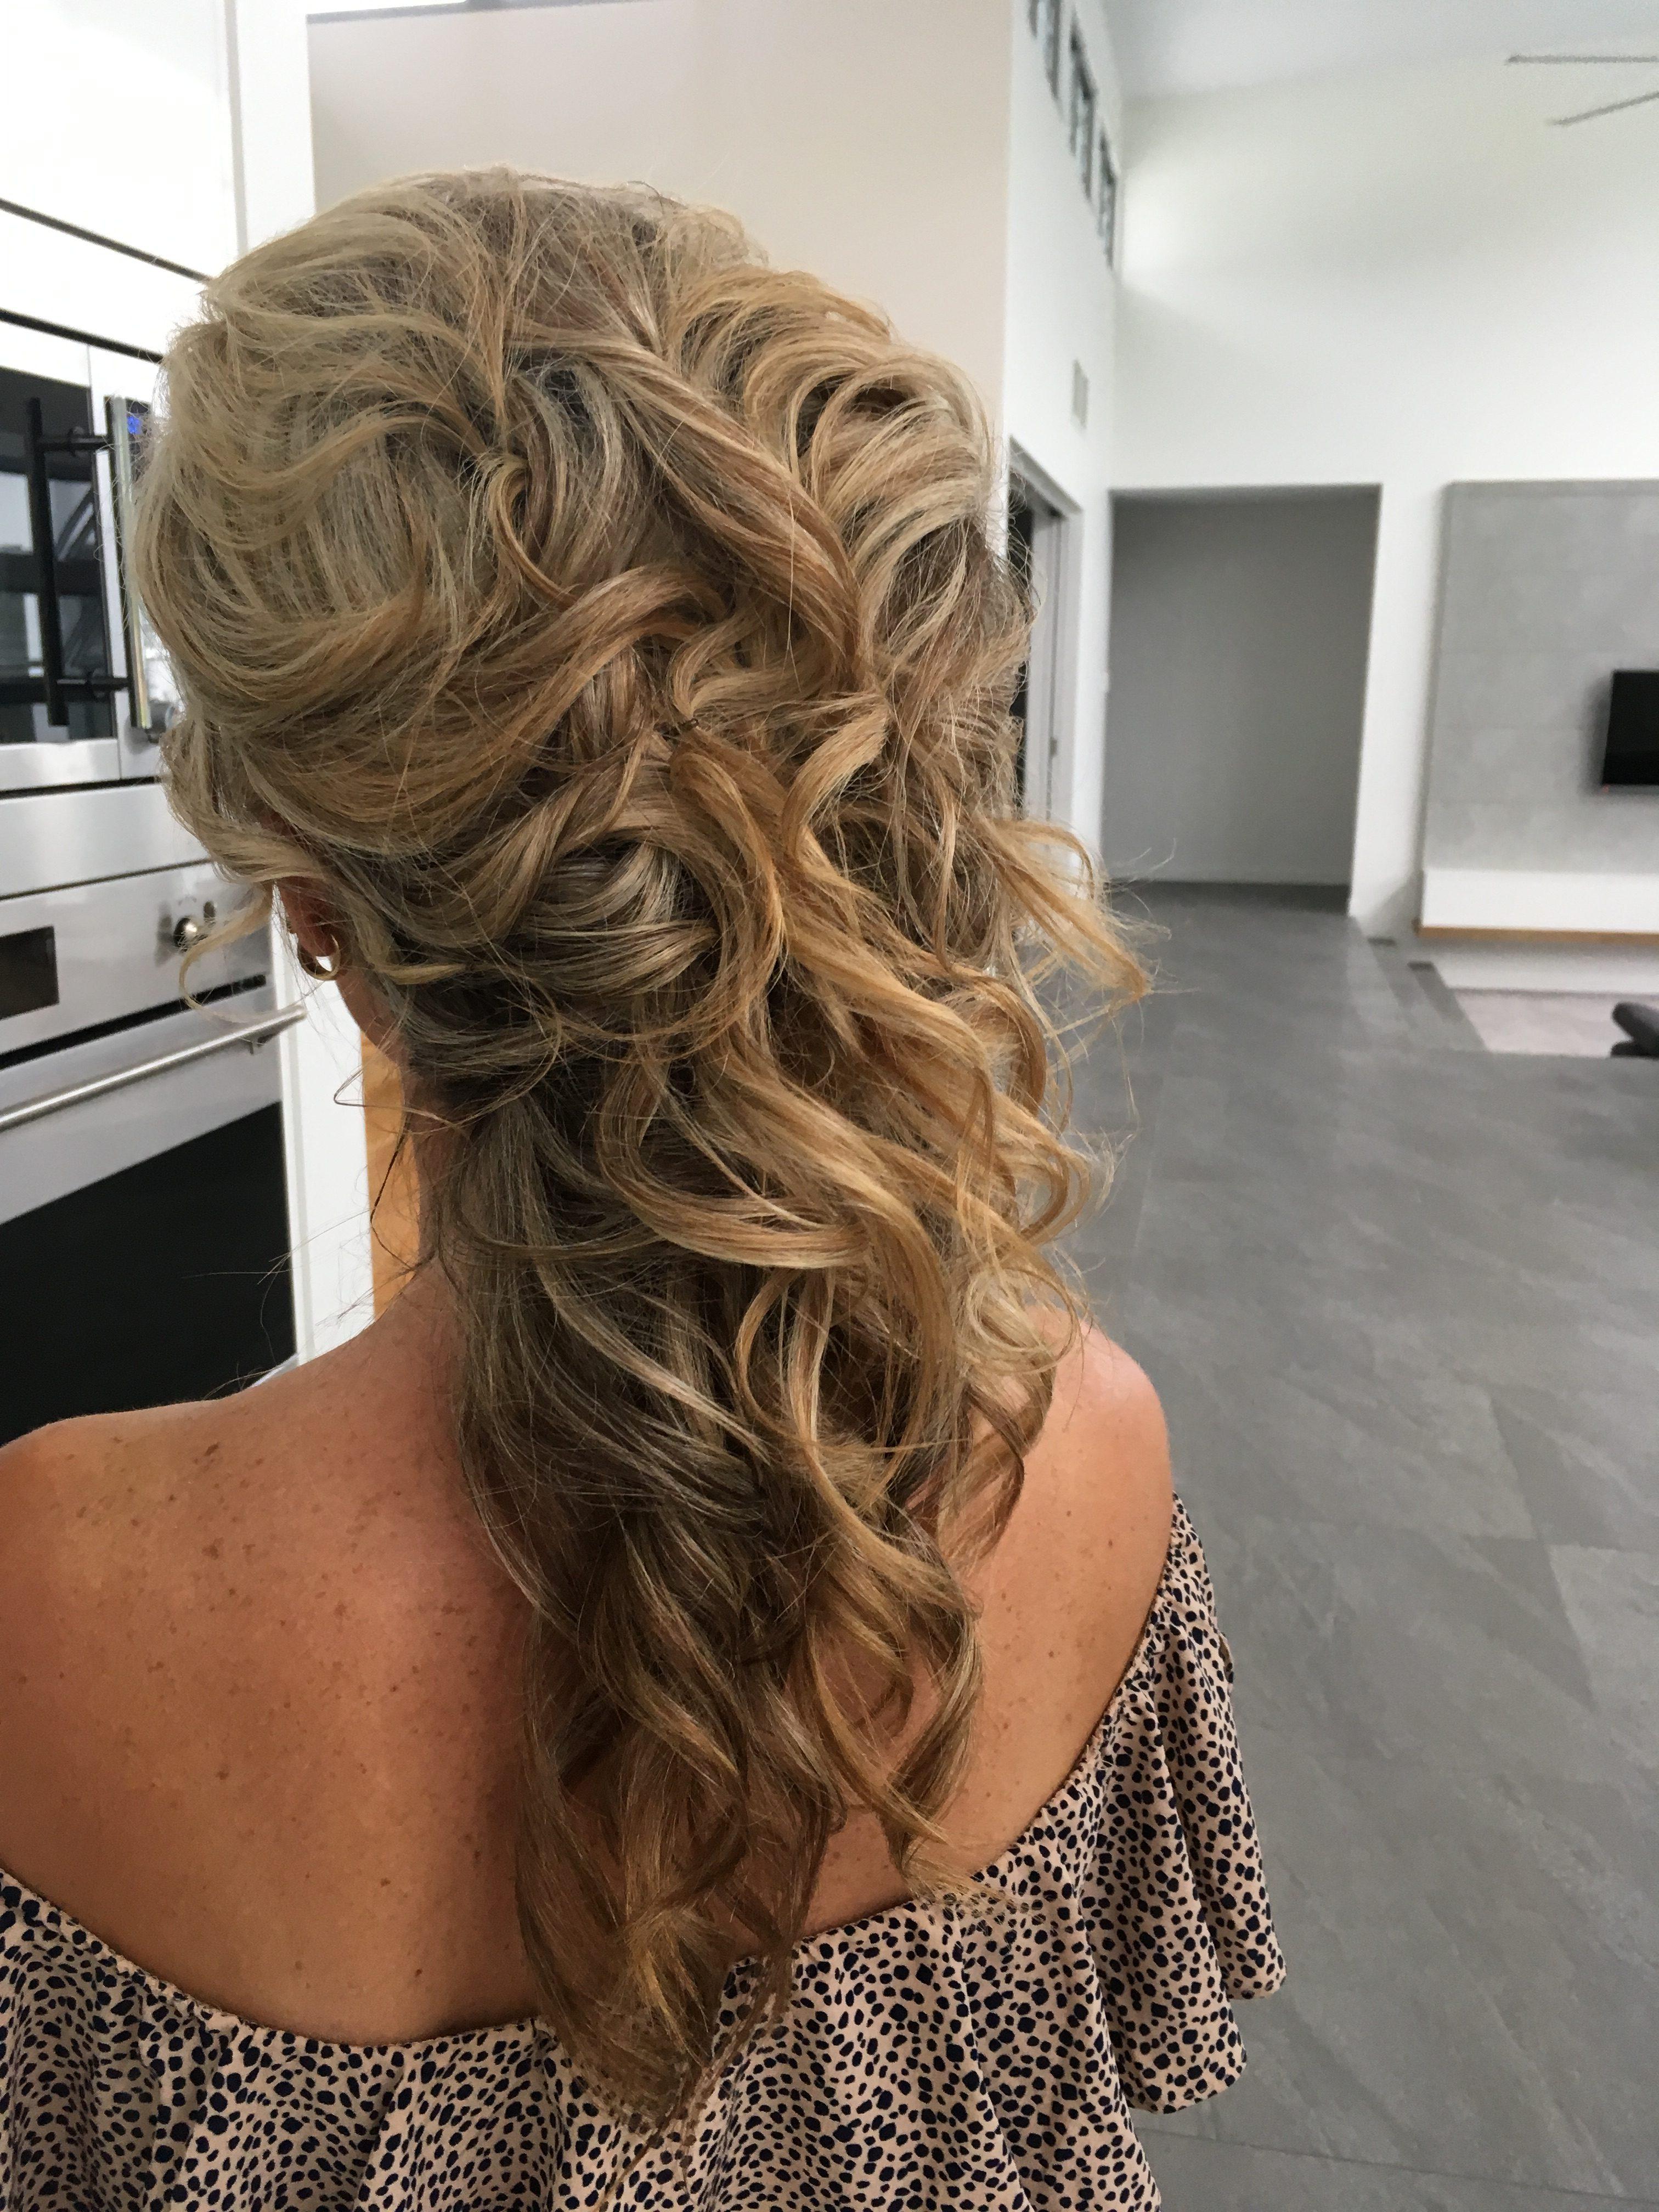 Mobile Bridal Hair And Makeup Ck Hair